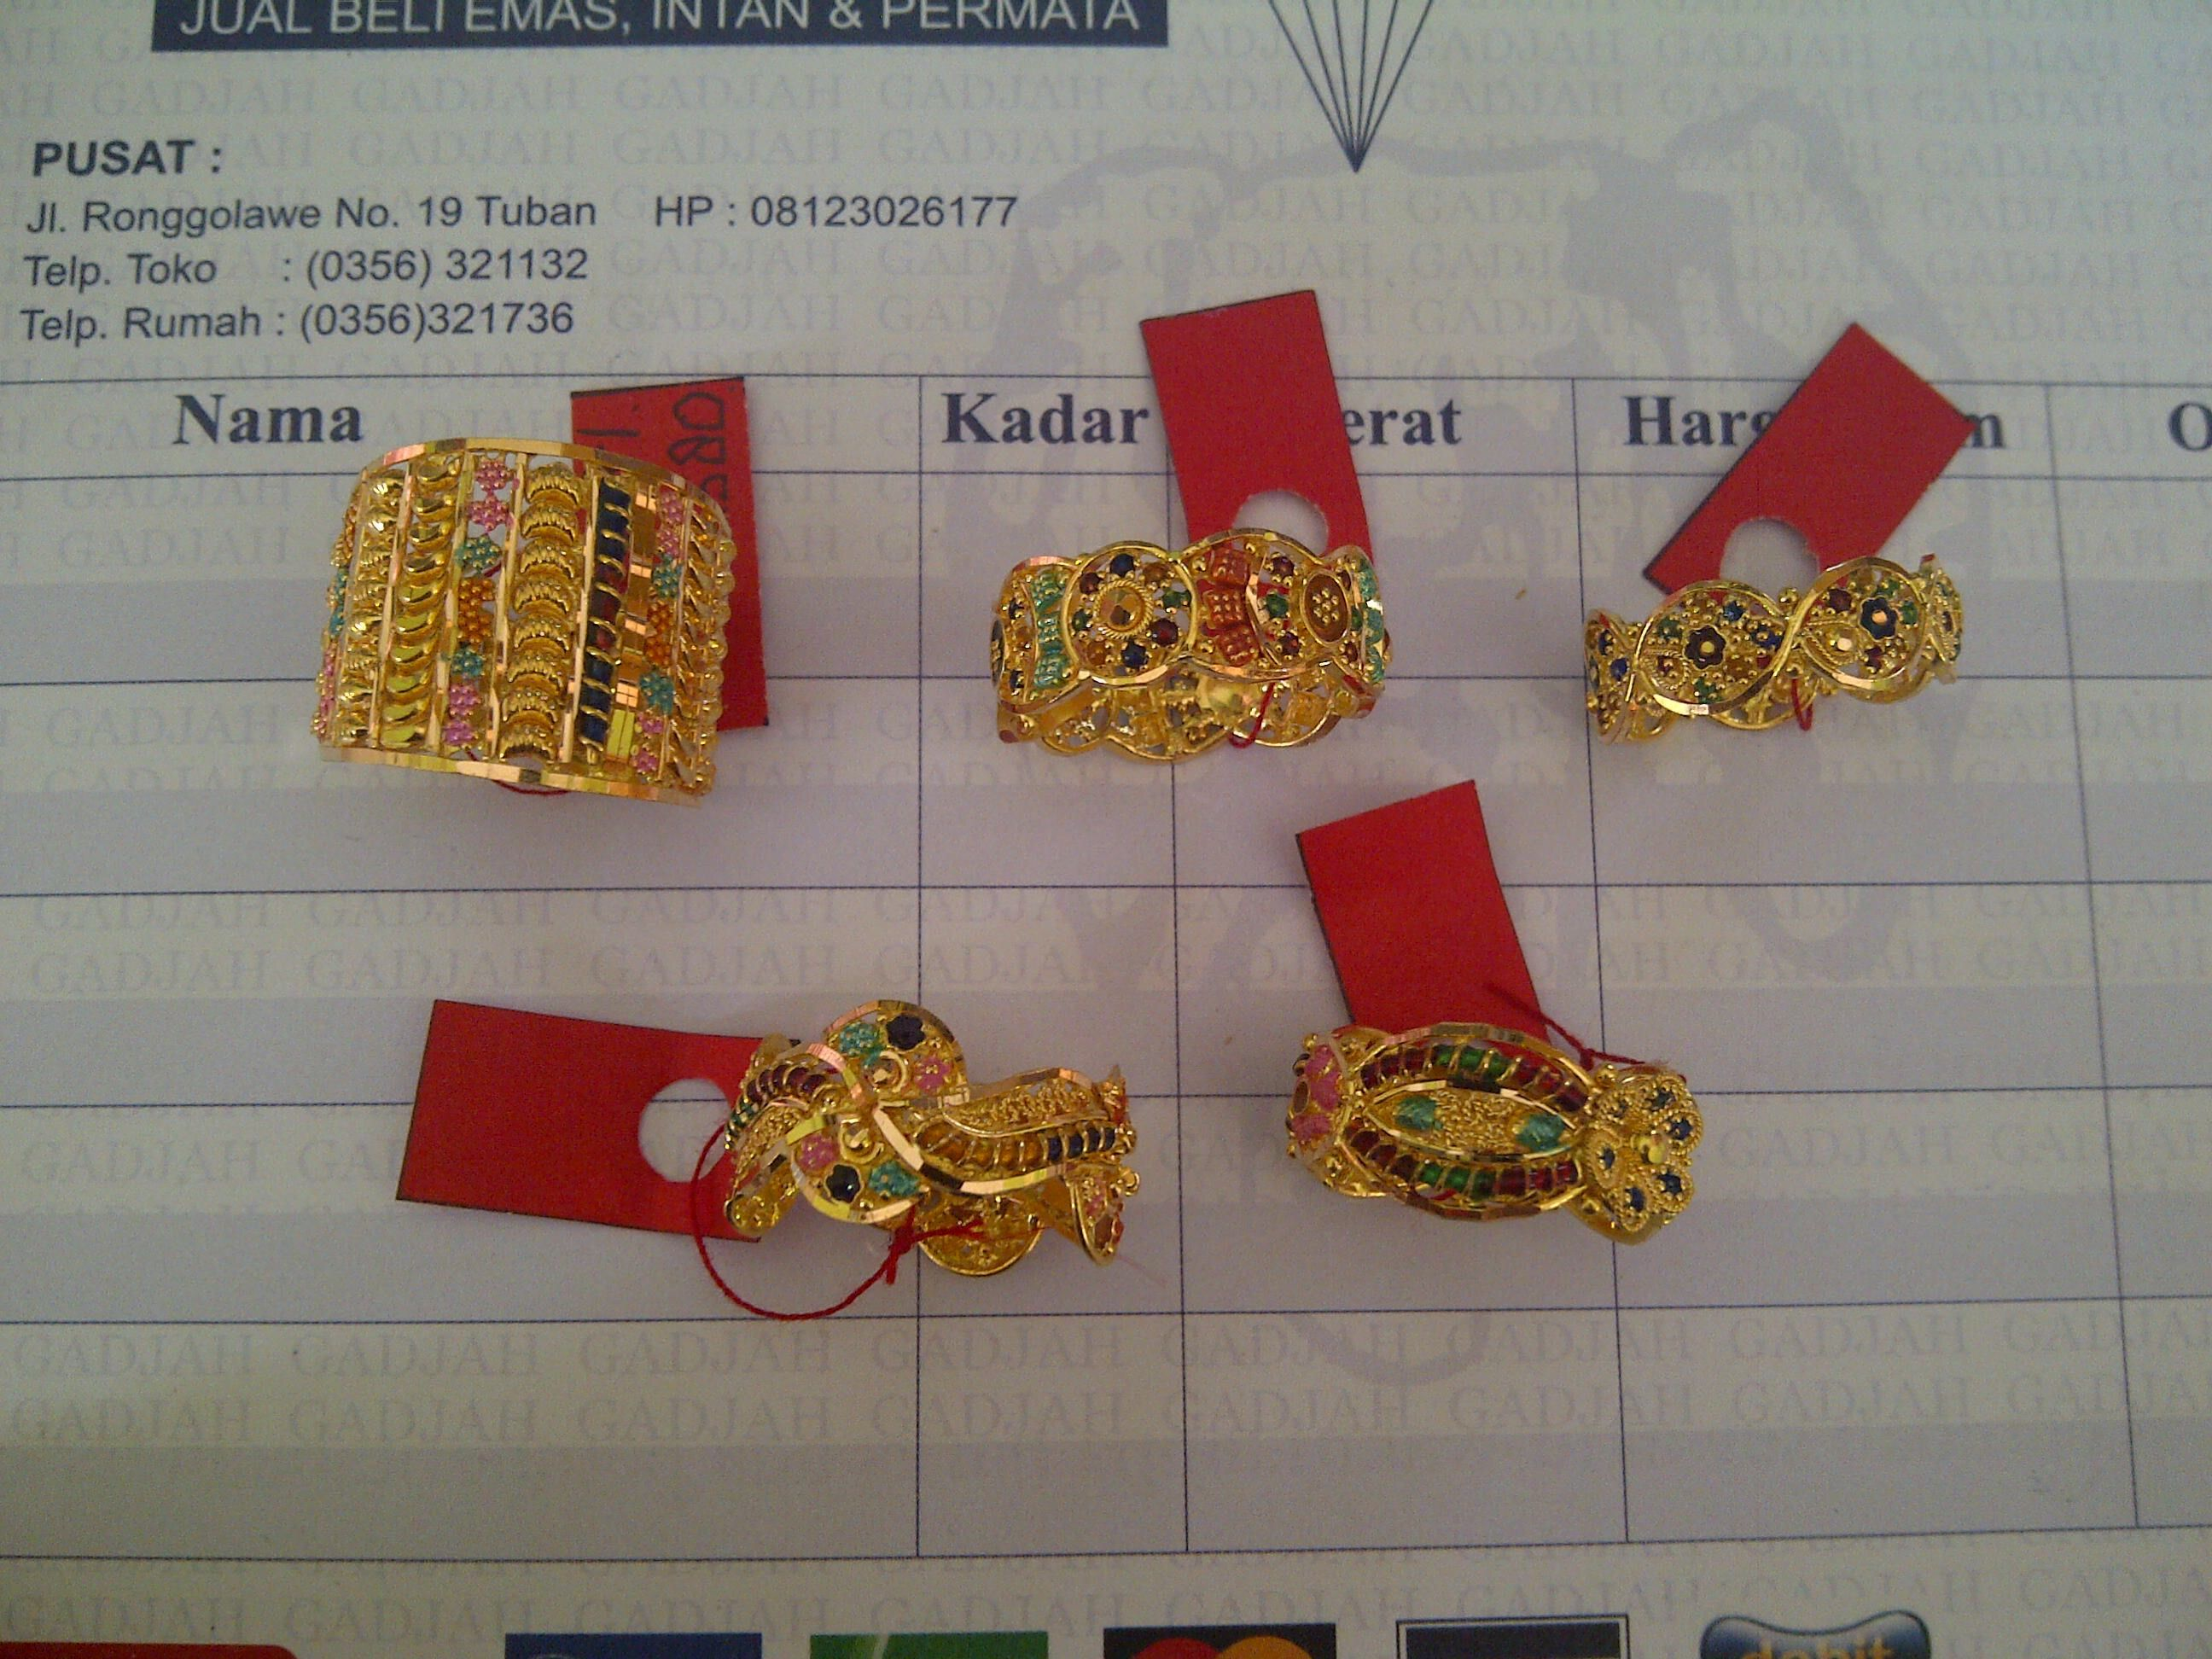 22k Gold India / Dubai Crown Rings | 22k & 24k Gold Jewelry ...